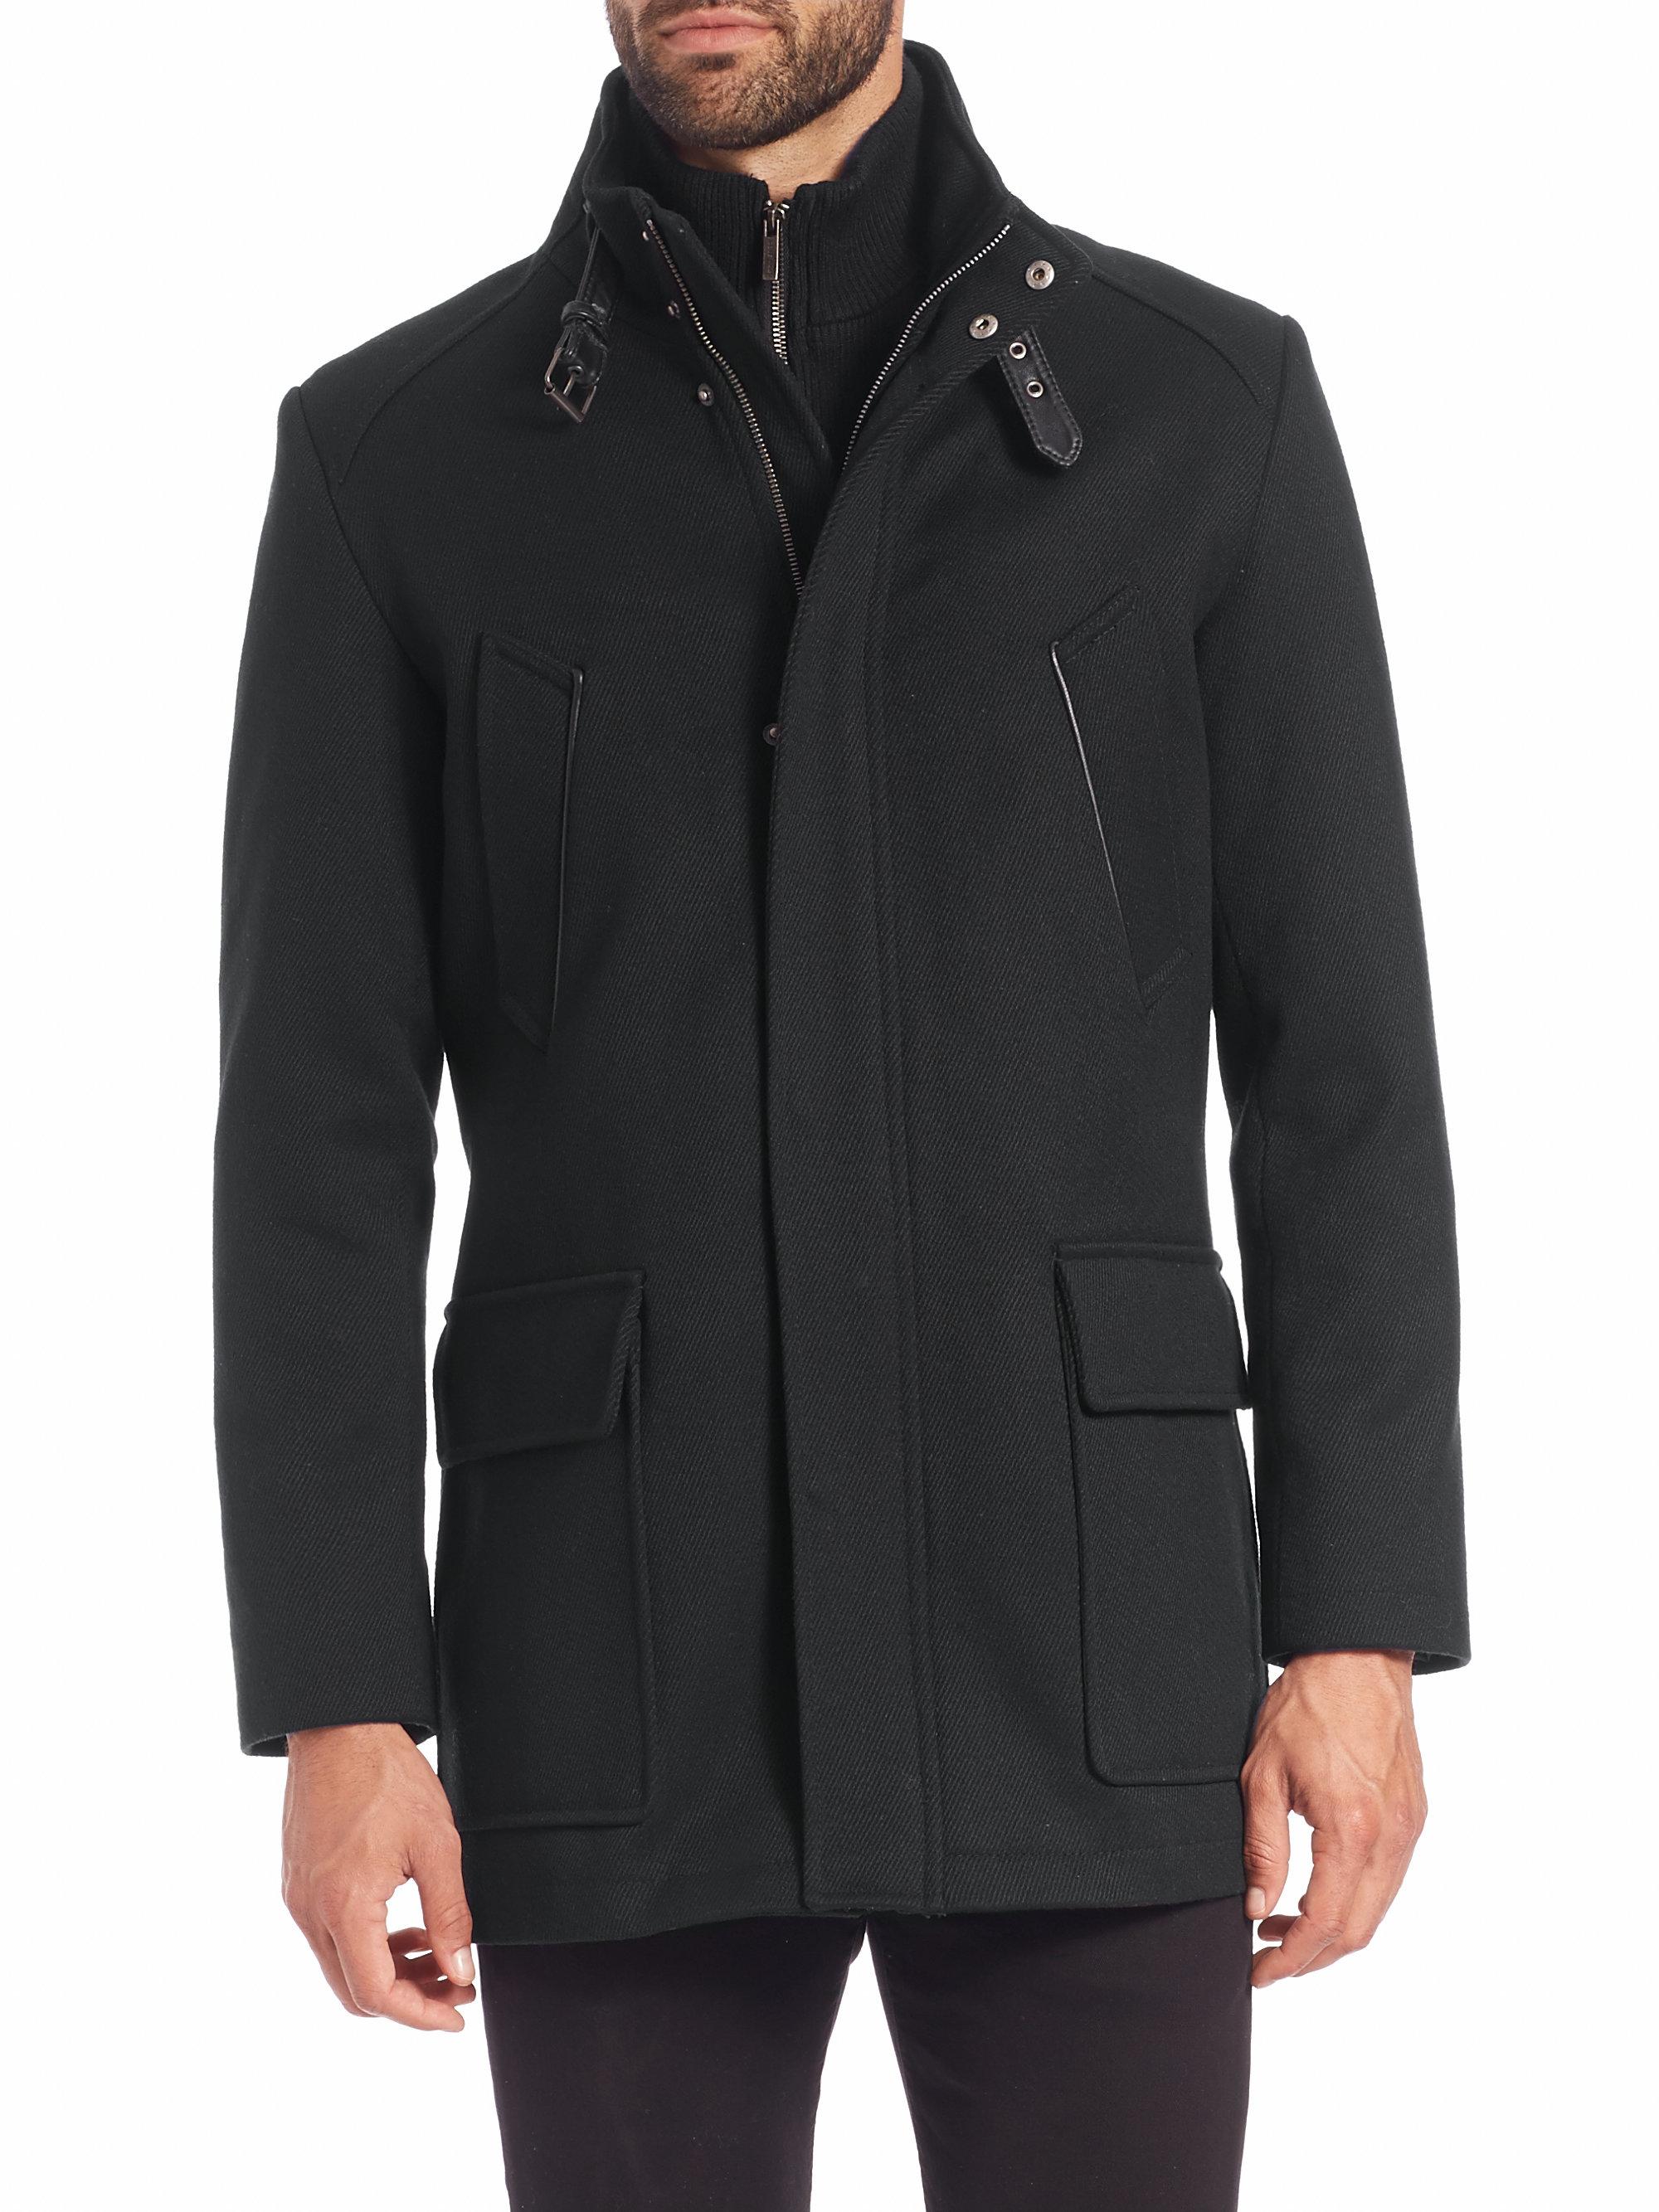 Cole Haan Wool Knit Bib Carcoat In Gray For Men Lyst